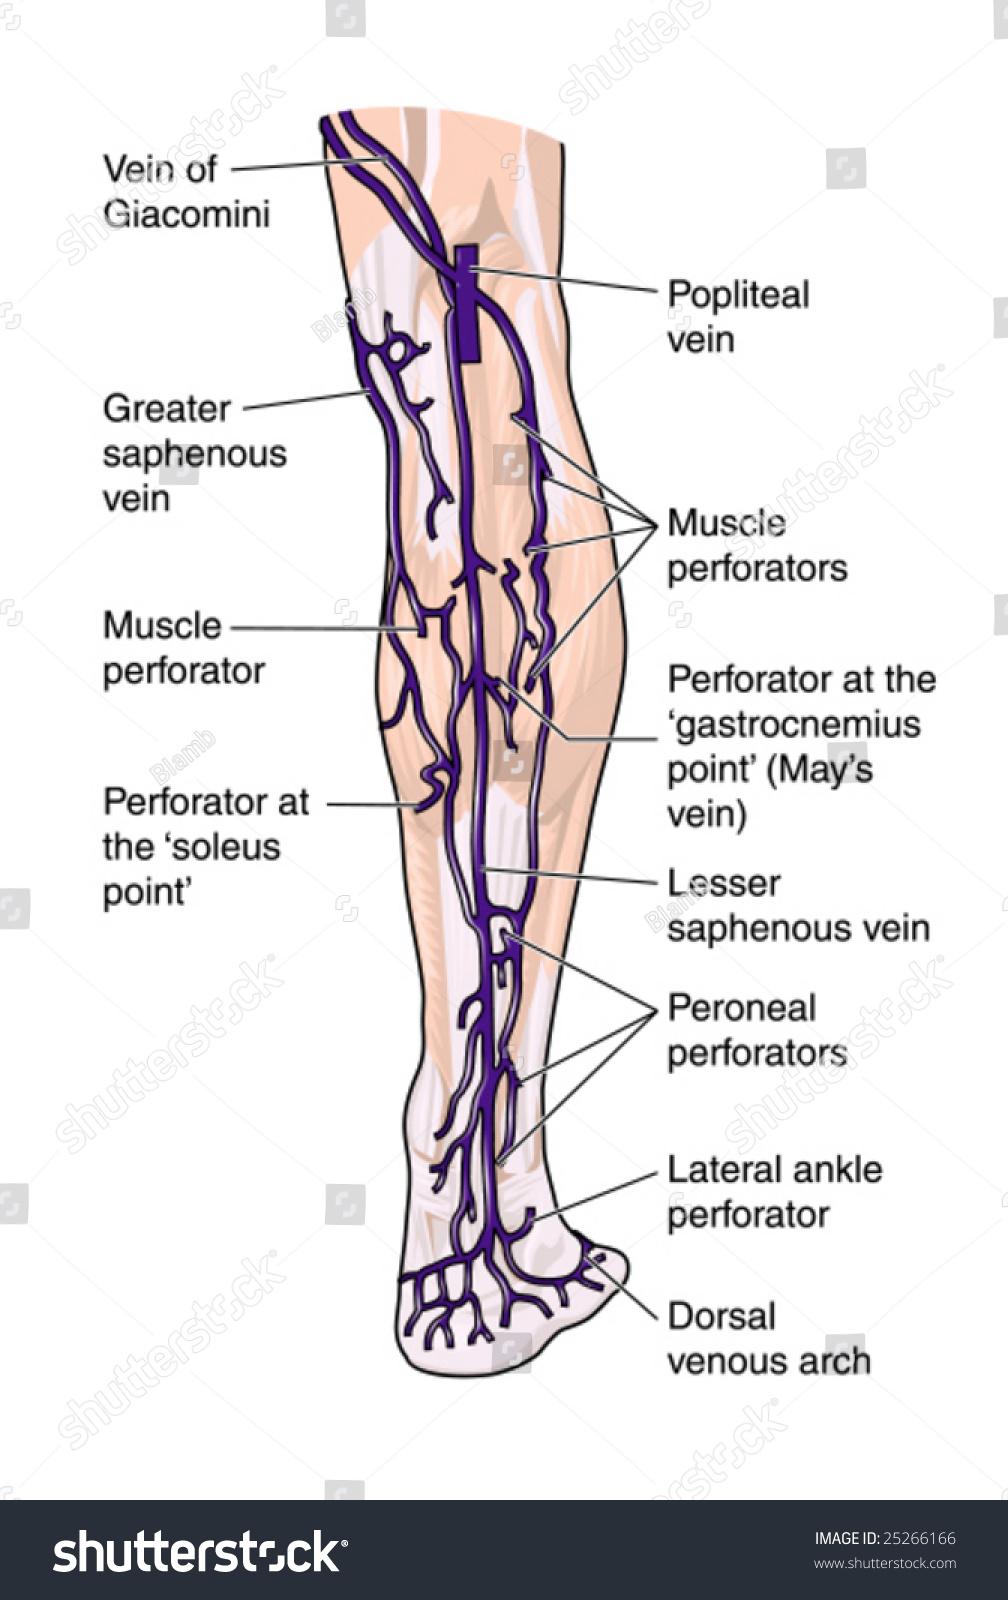 Royalty-free Leg veins posterior - labeled #25266166 Stock Photo ...